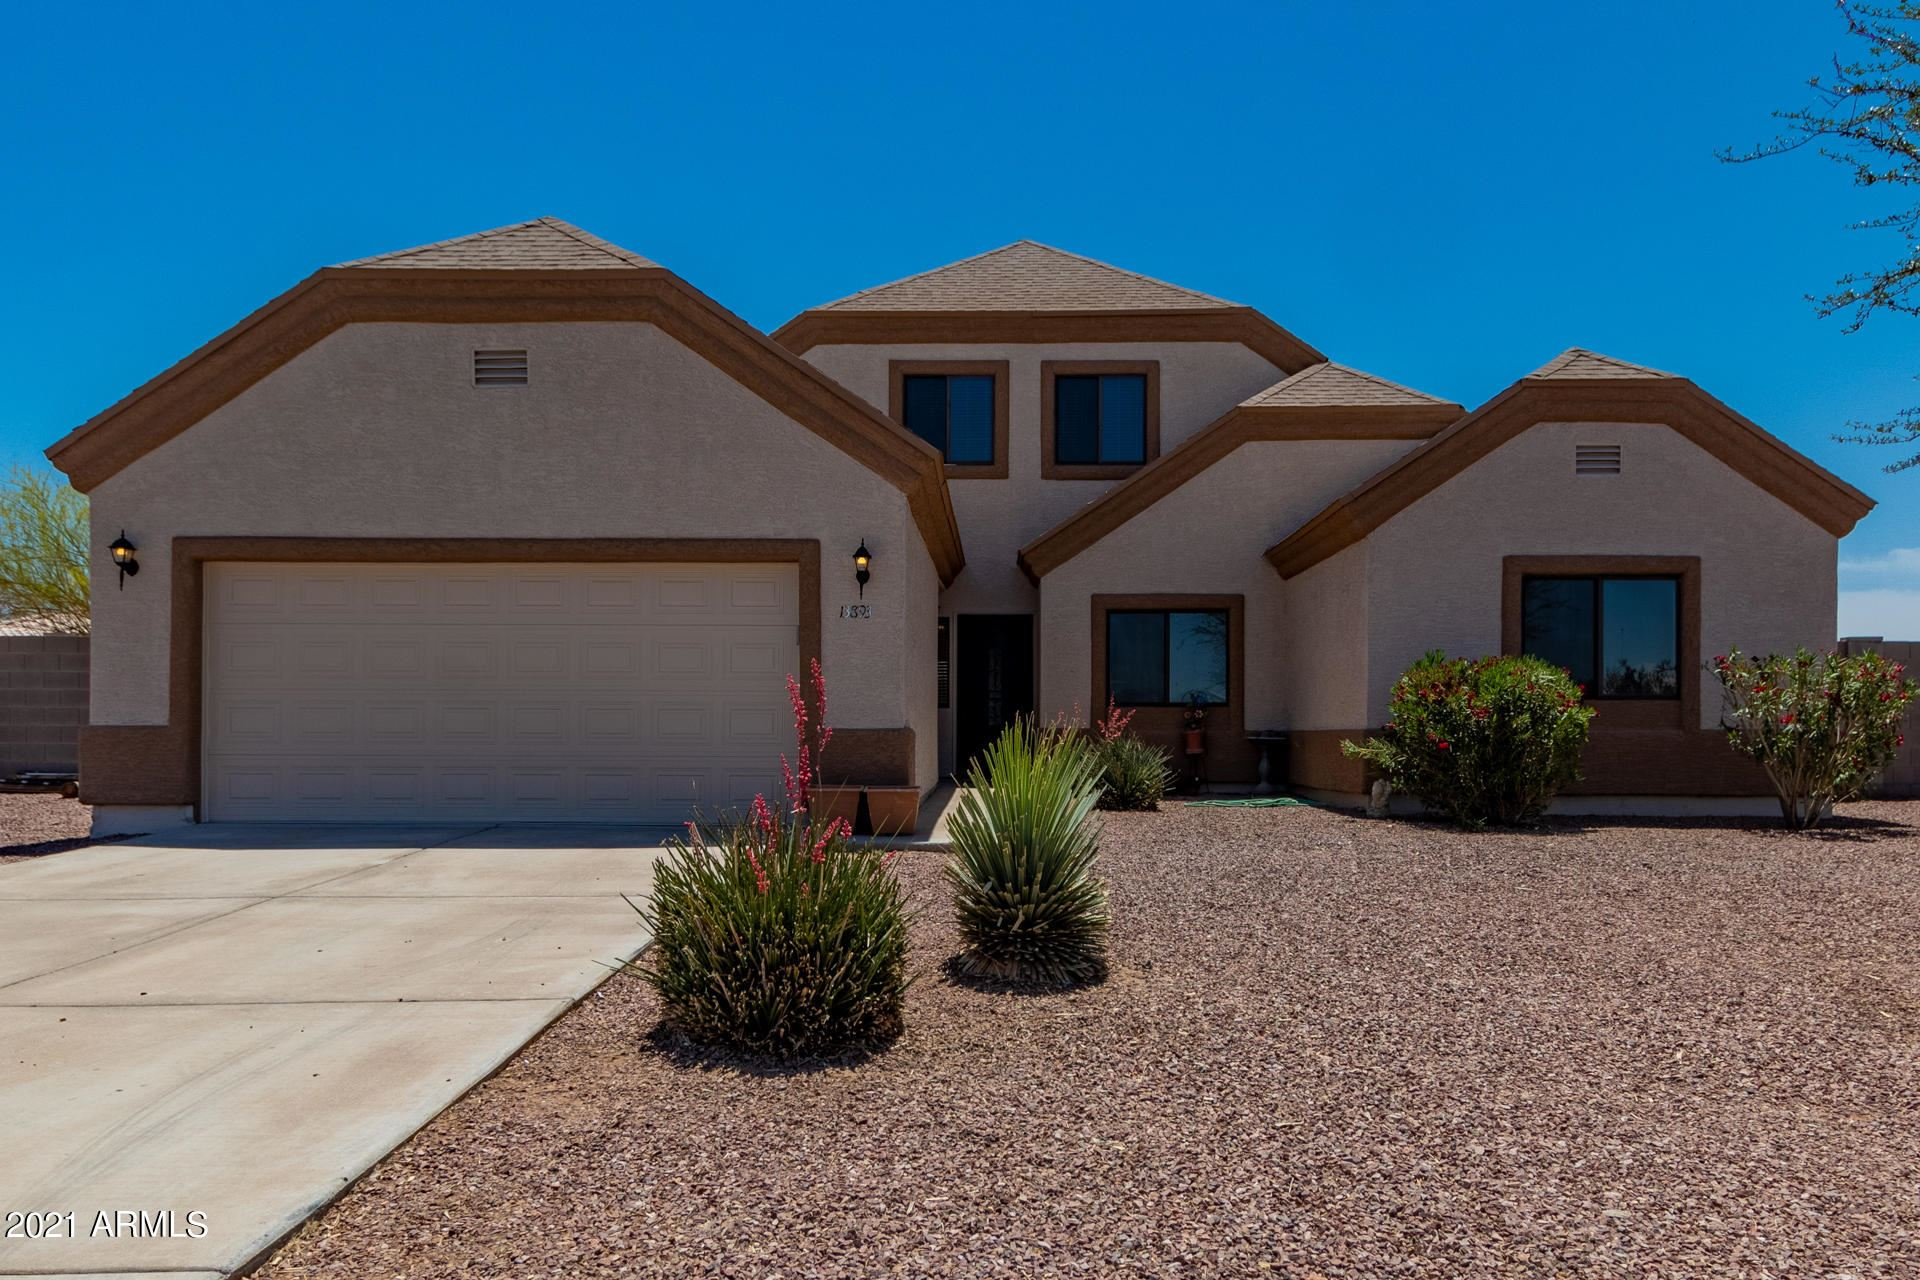 13893 S AMADO Boulevard, Arizona City, AZ 85123 - MLS#: 6234463